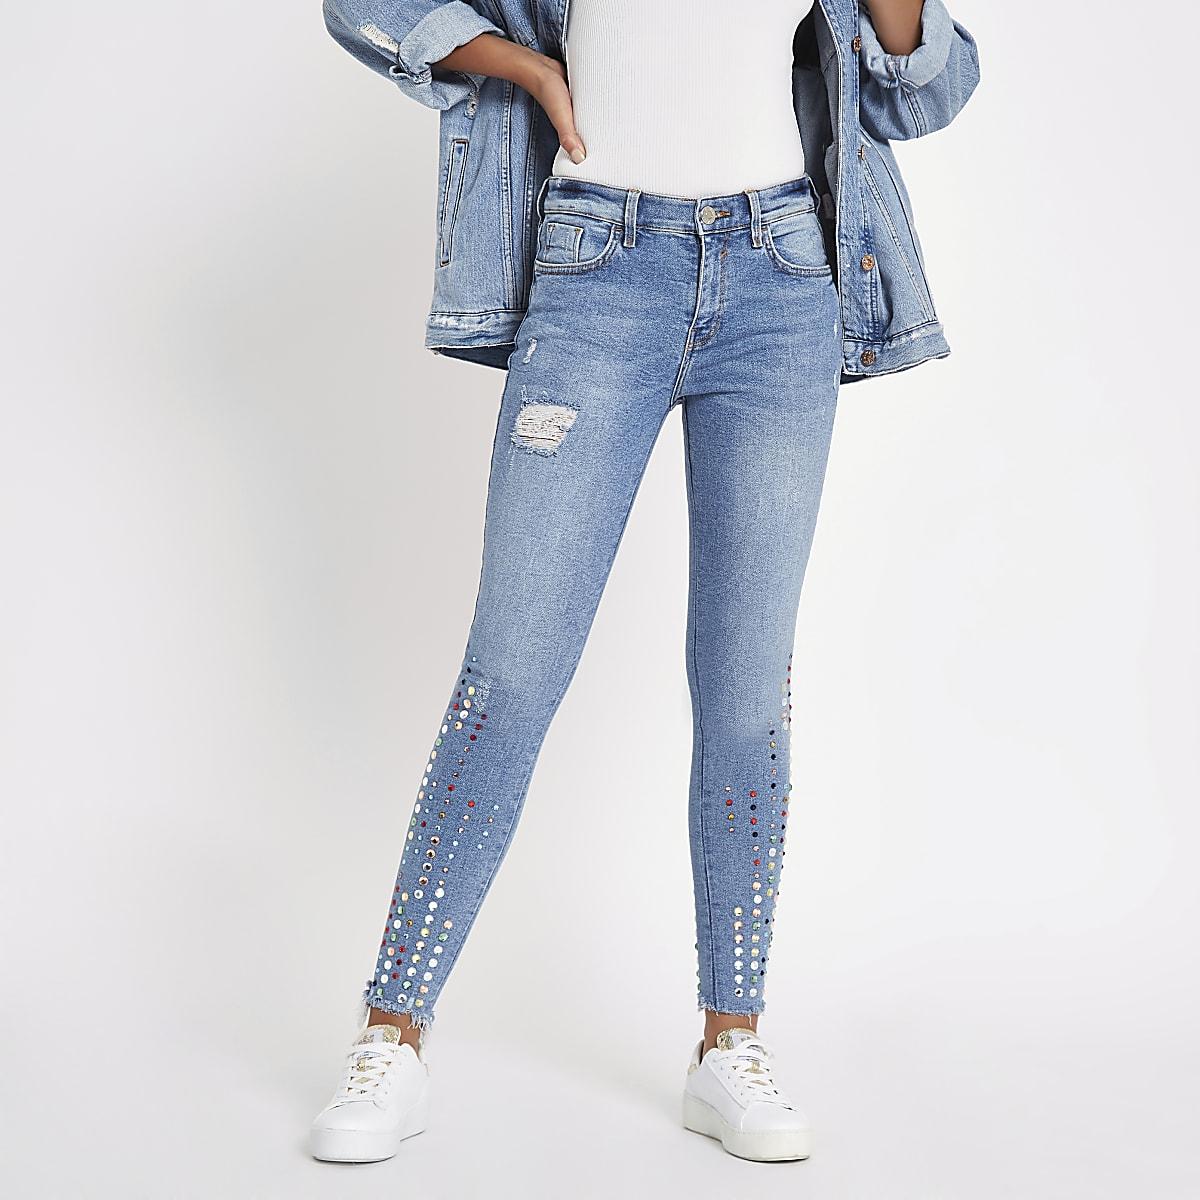 Blue Amelie gemstone mid rise skinny jeans